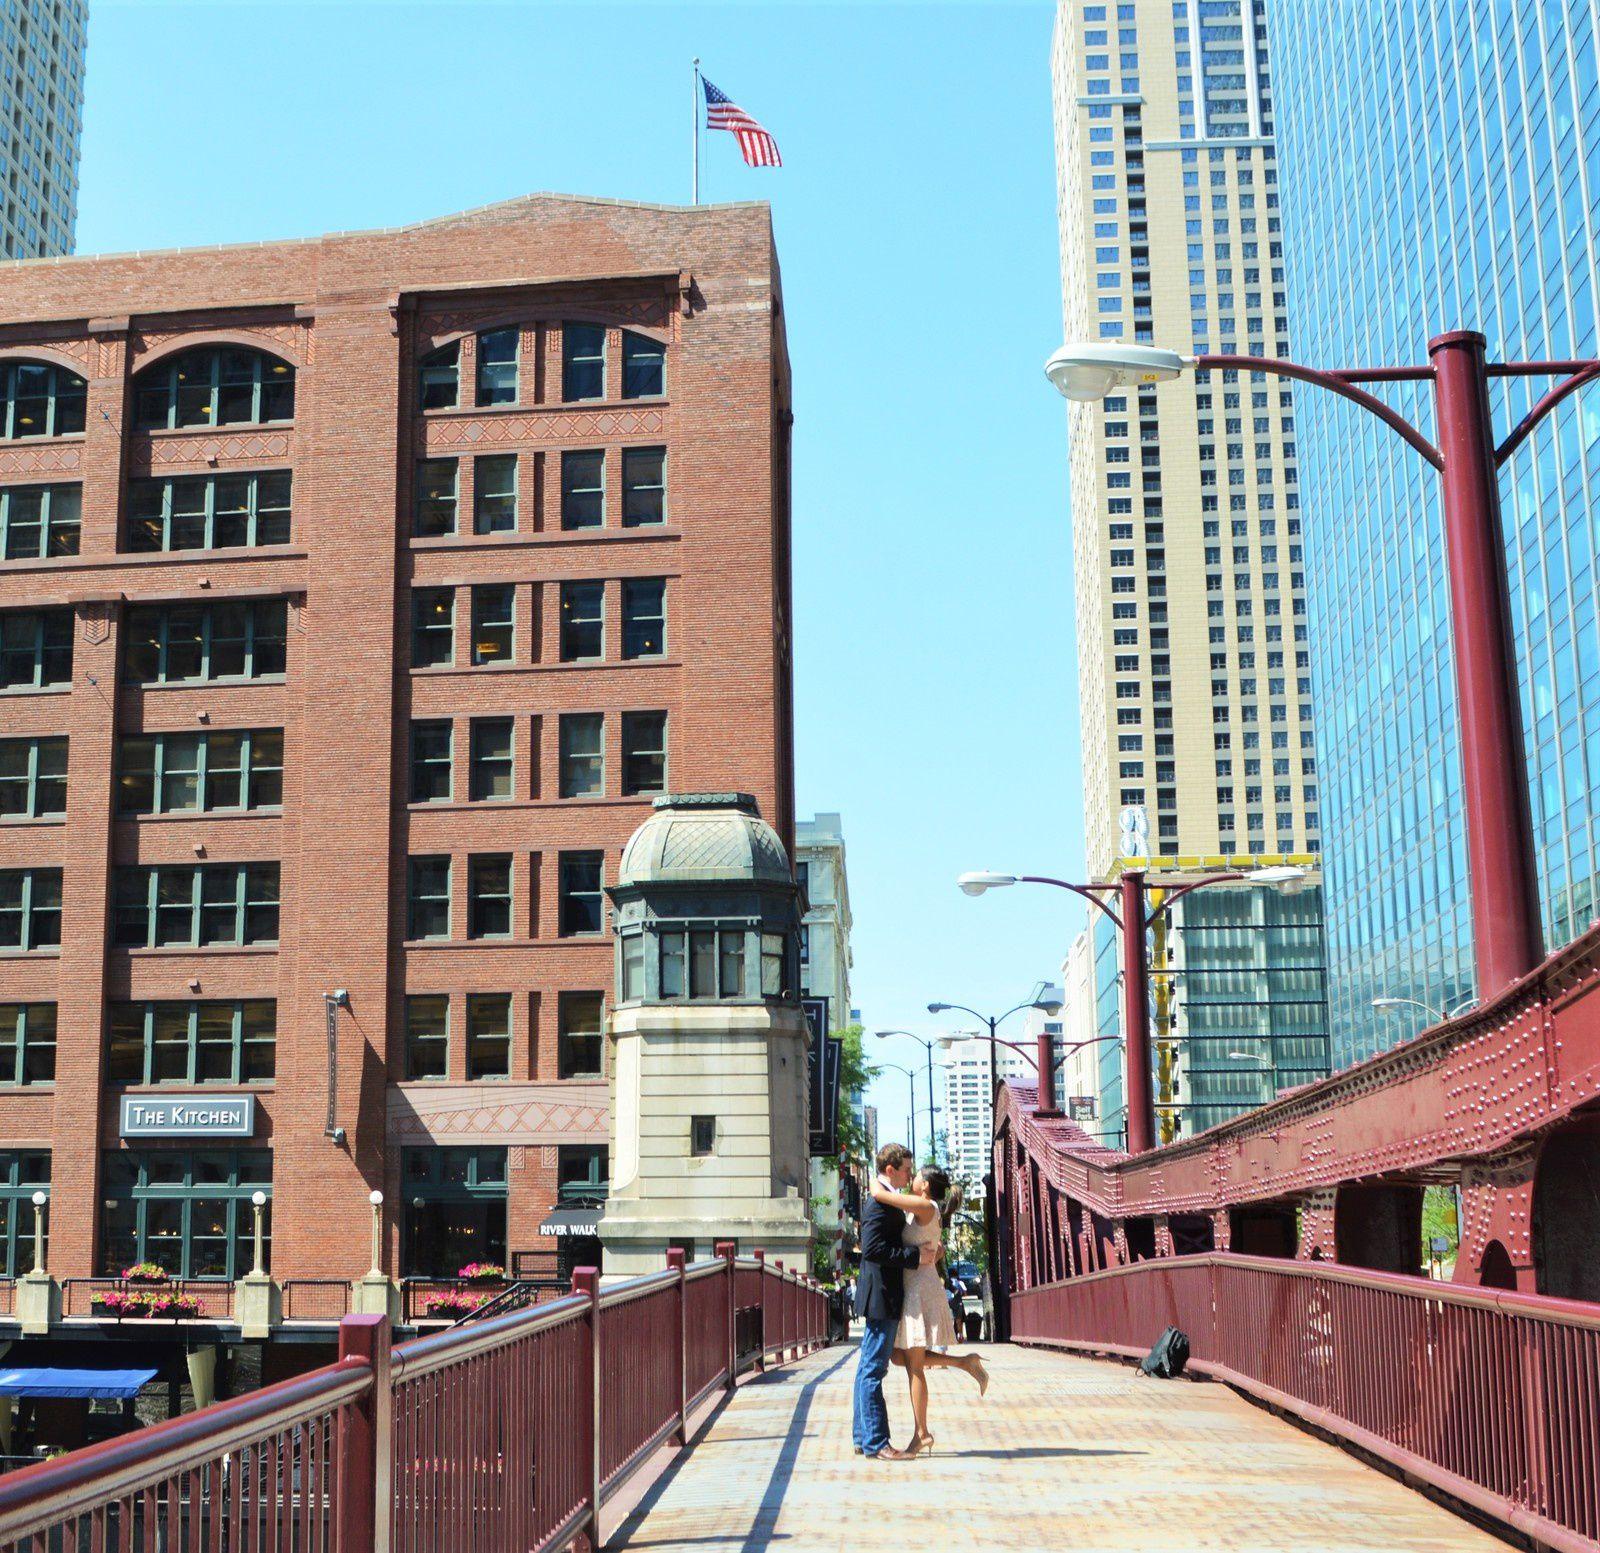 Chicago - Part 1